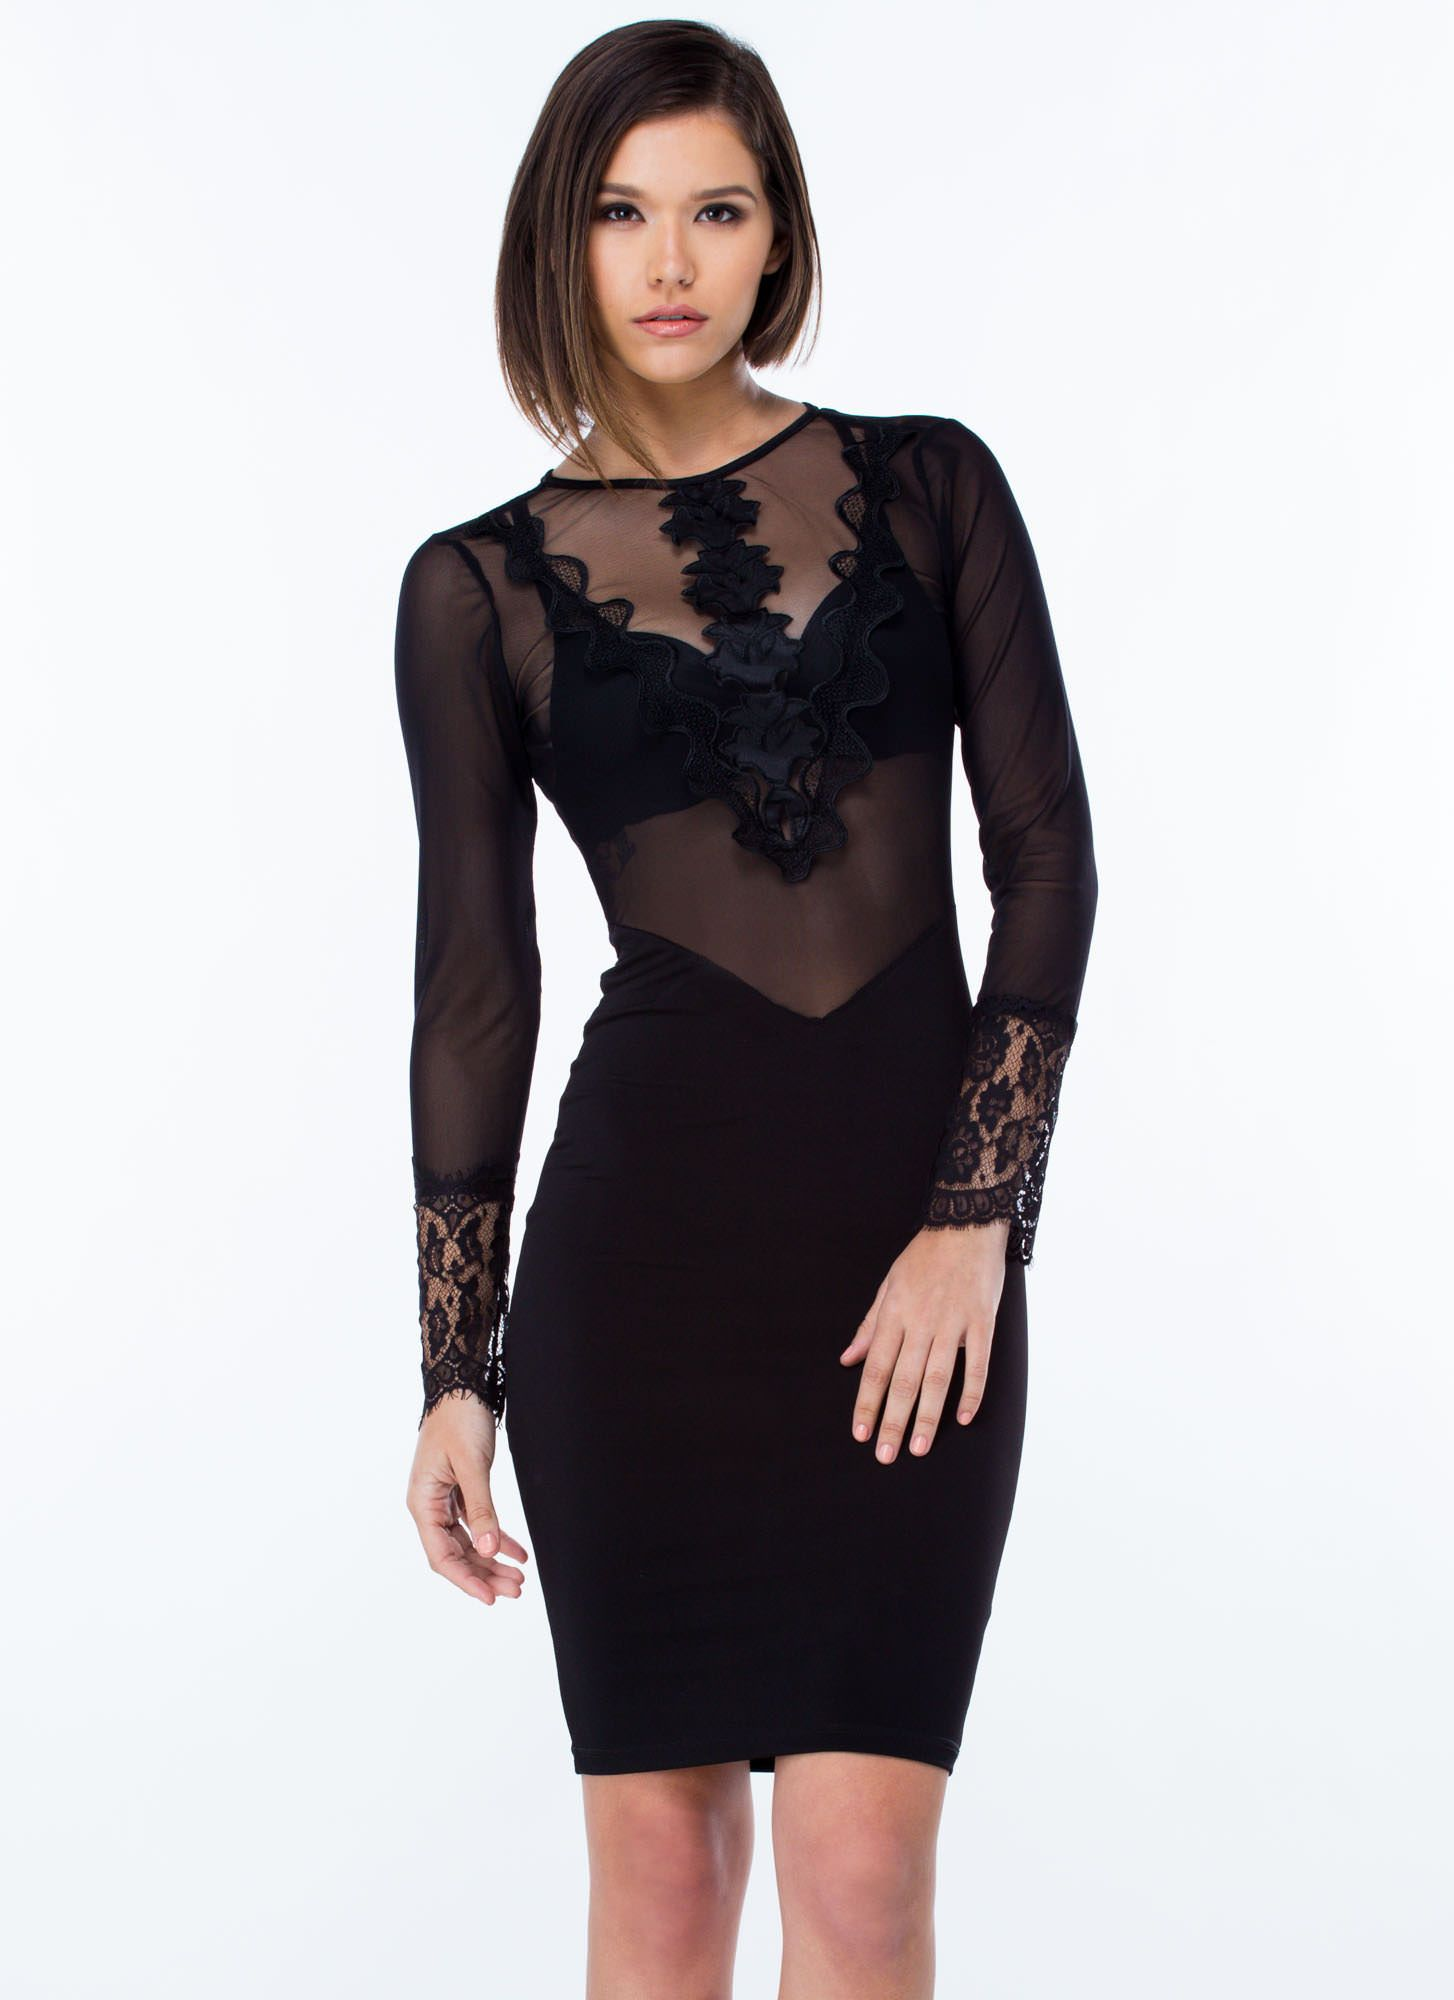 Black Lace Dress Bodycon Dress Stretchy Bodycon Dress Backless Bodycon Dresses [ 2000 x 1454 Pixel ]